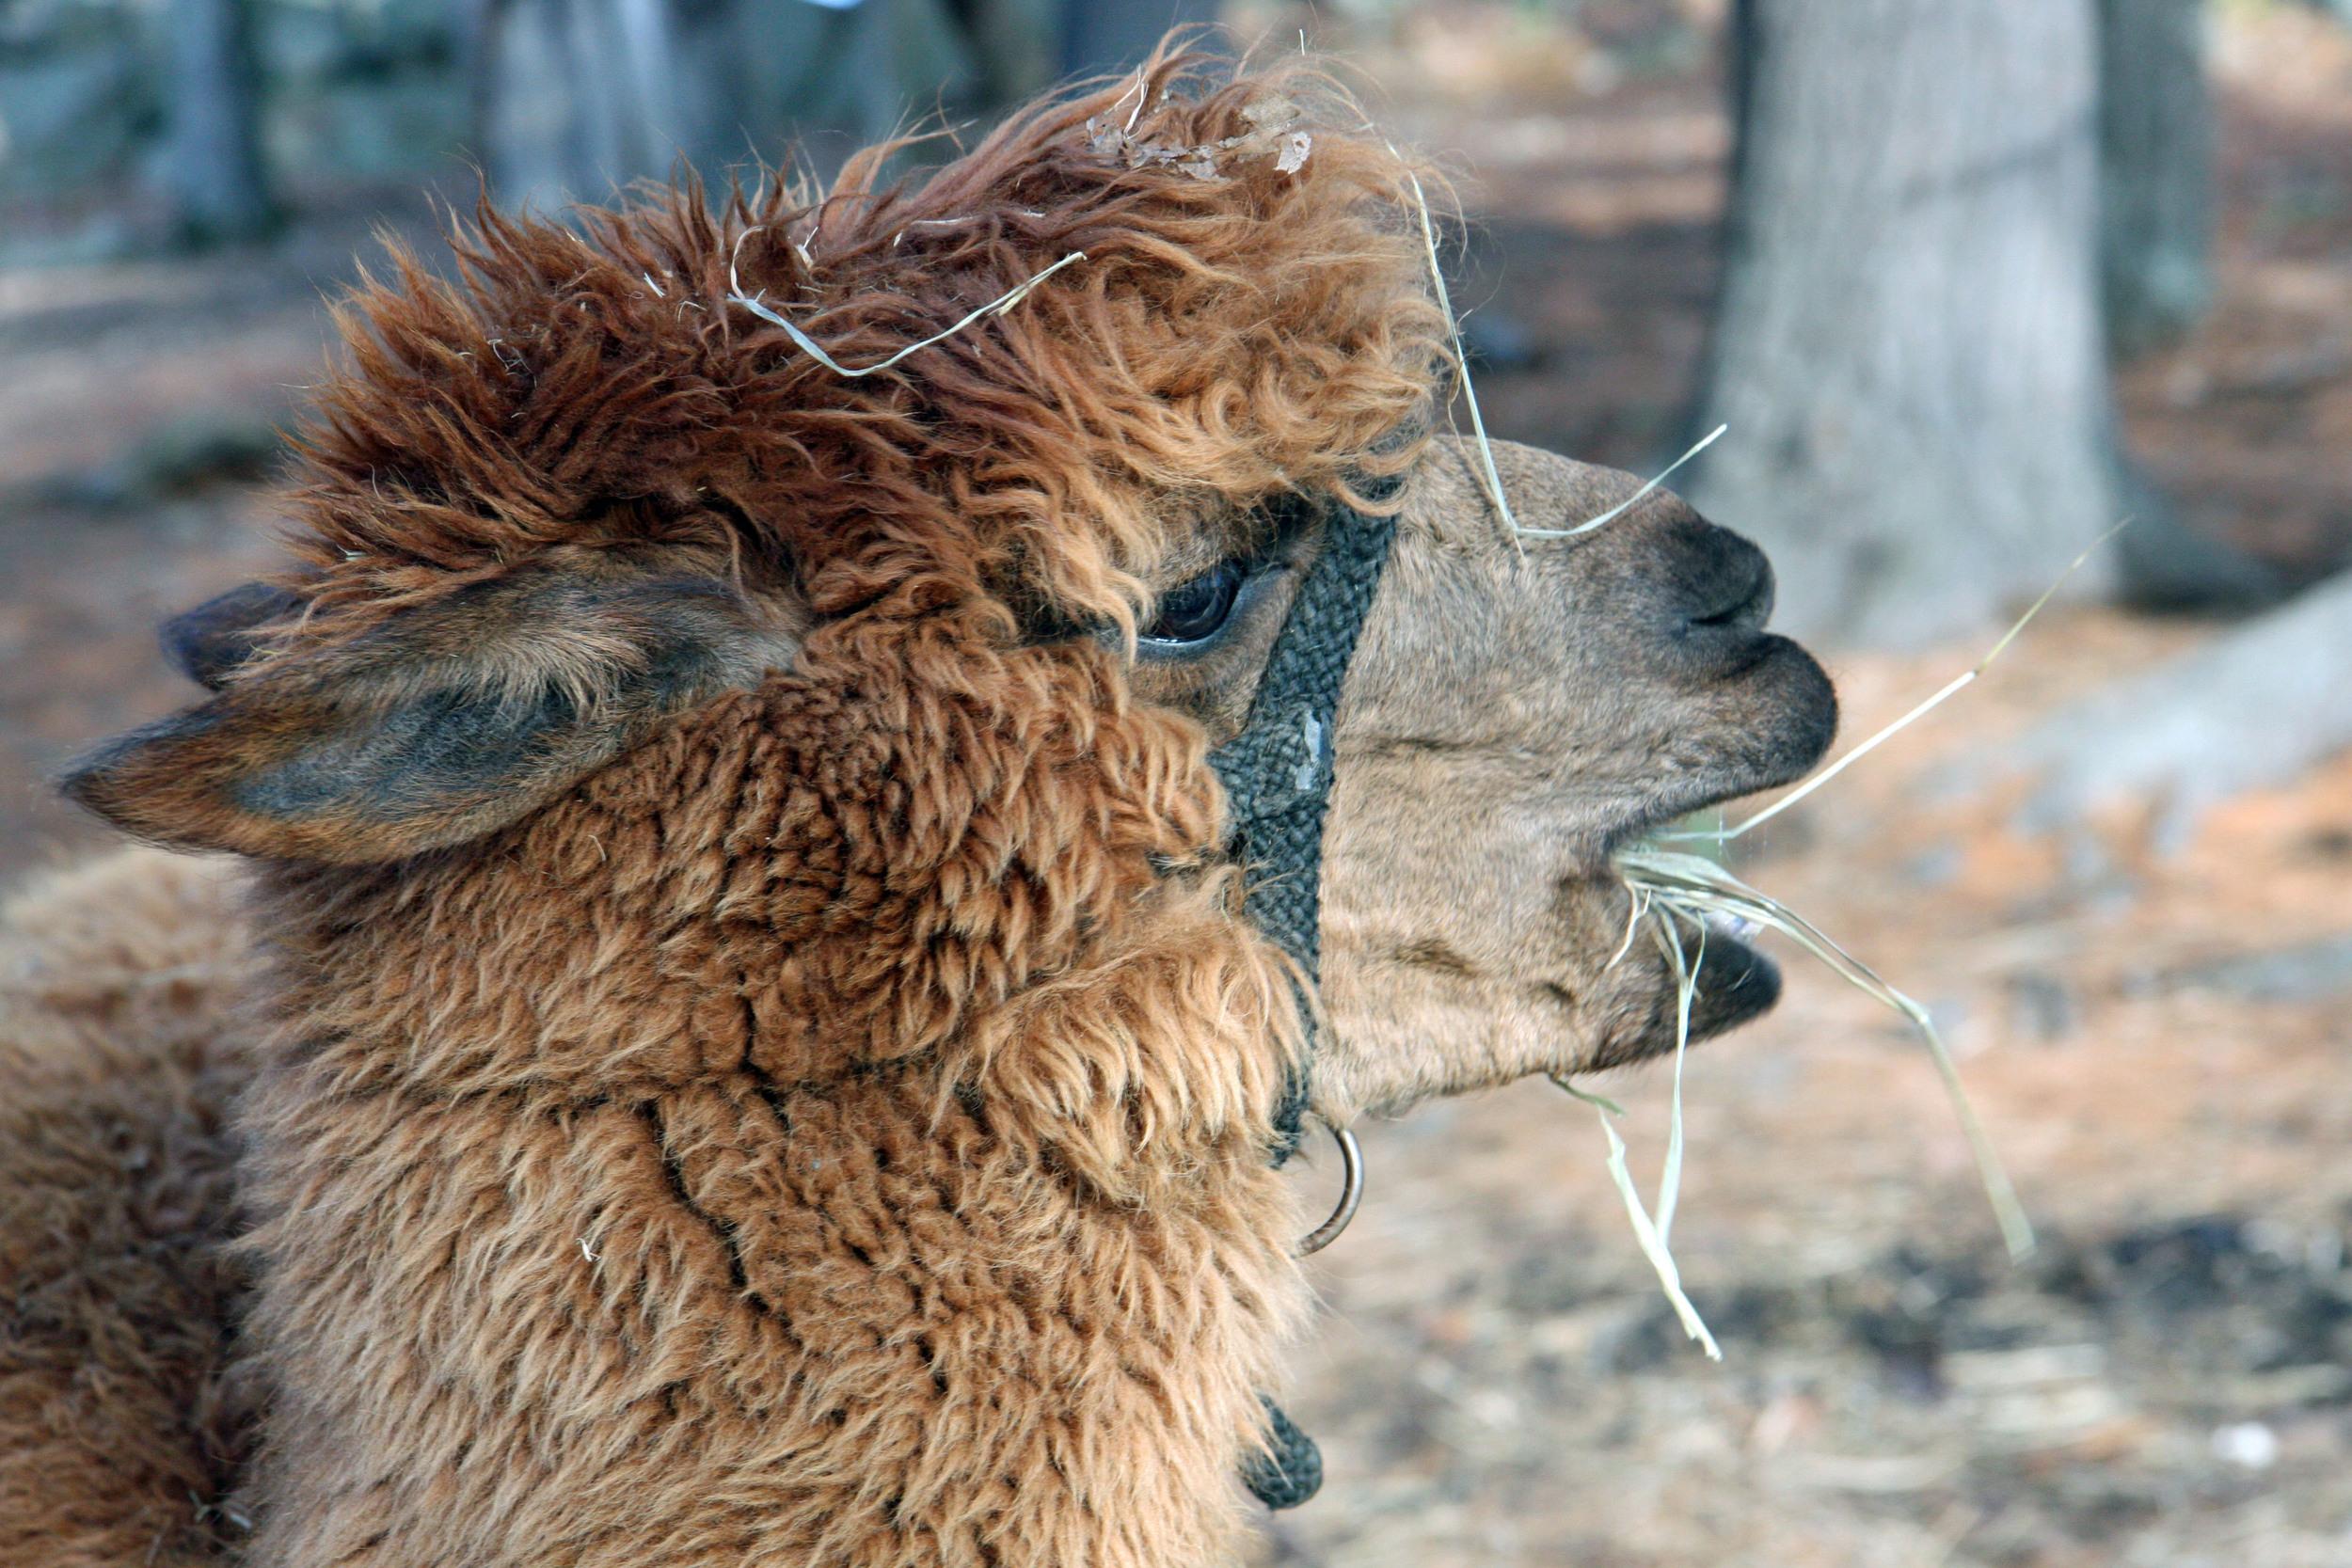 Say hi to an alpaca at the farm!